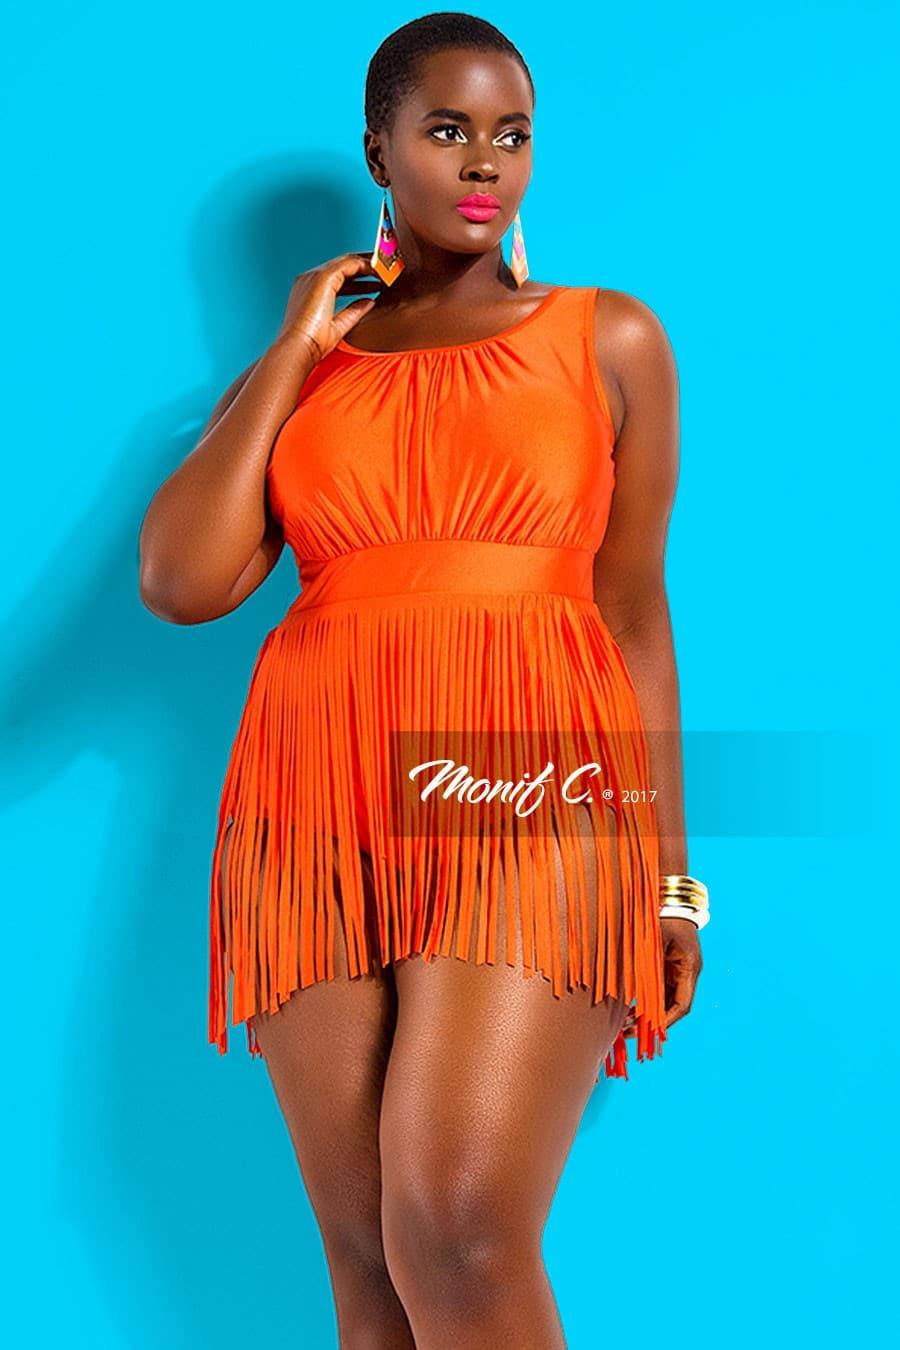 Peru Fringe Skirt Plus Size Swimsuit from Monif C.